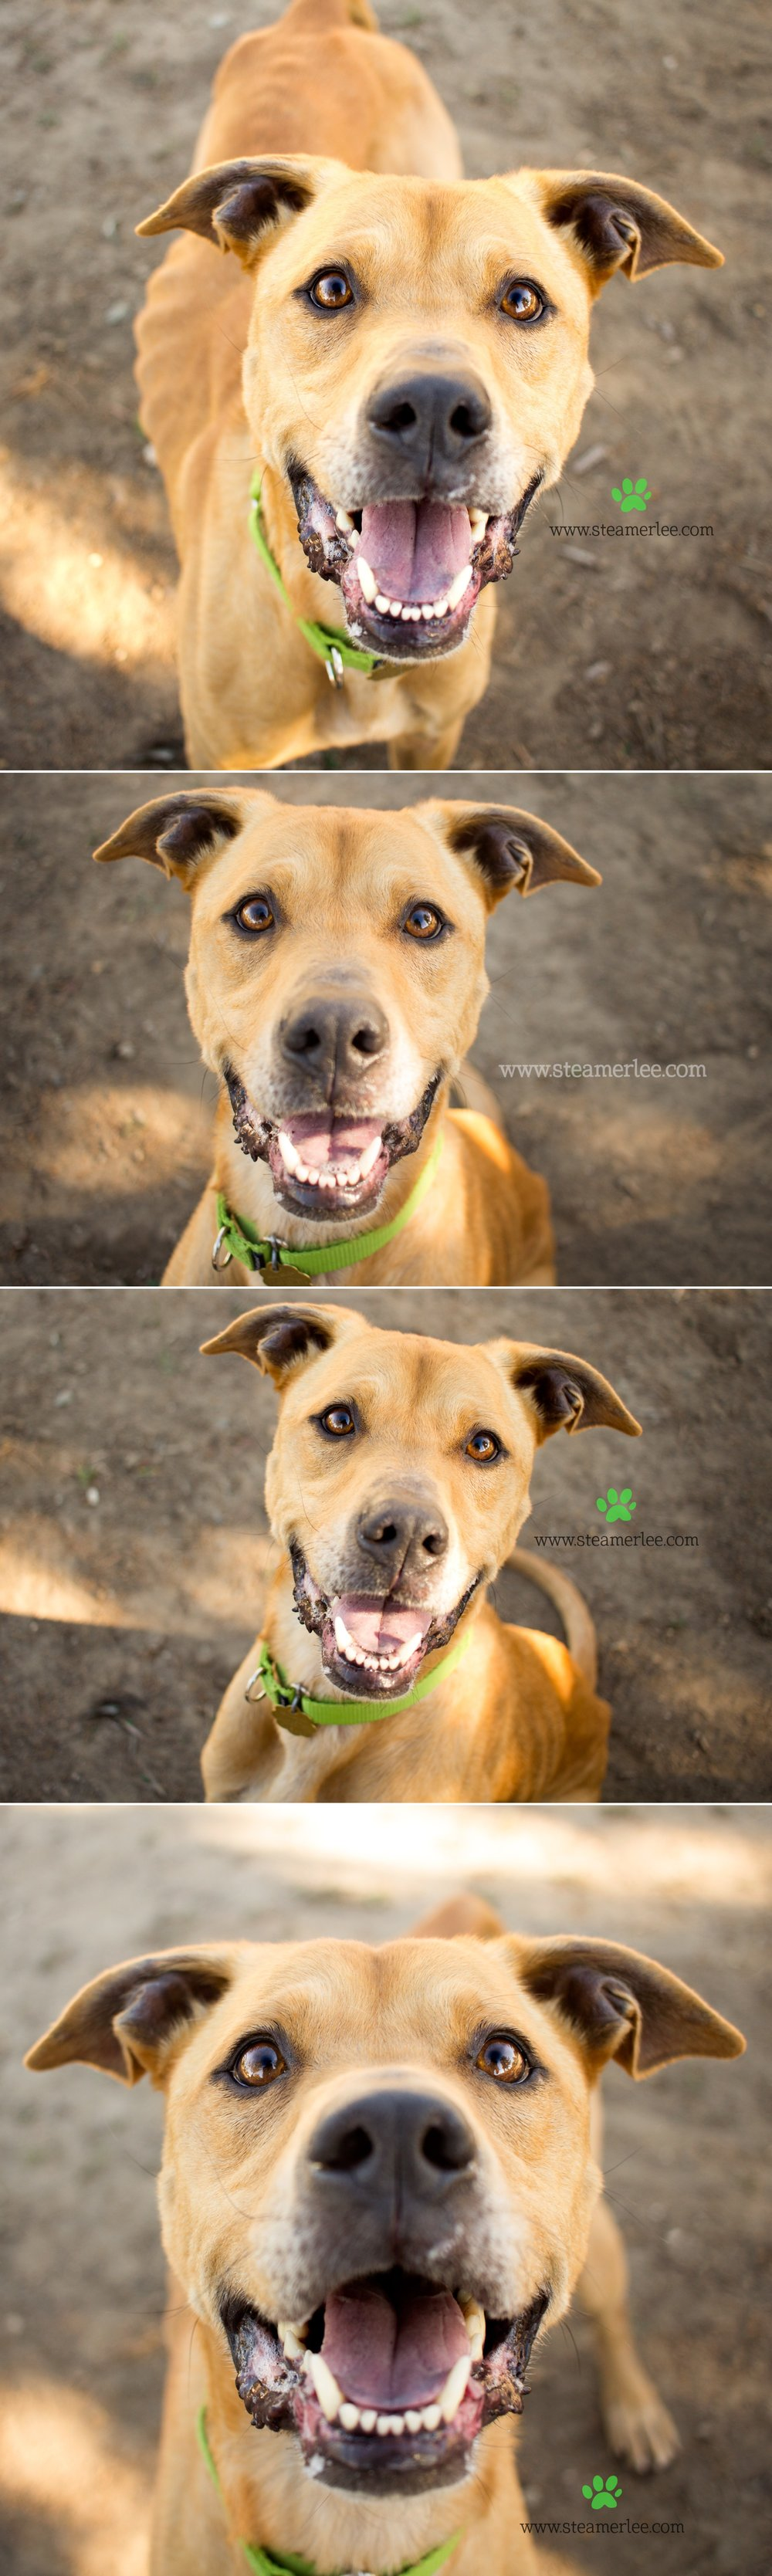 01 Steamer Lee Dog Photography - Seal Beach Animal Care Center.JPG